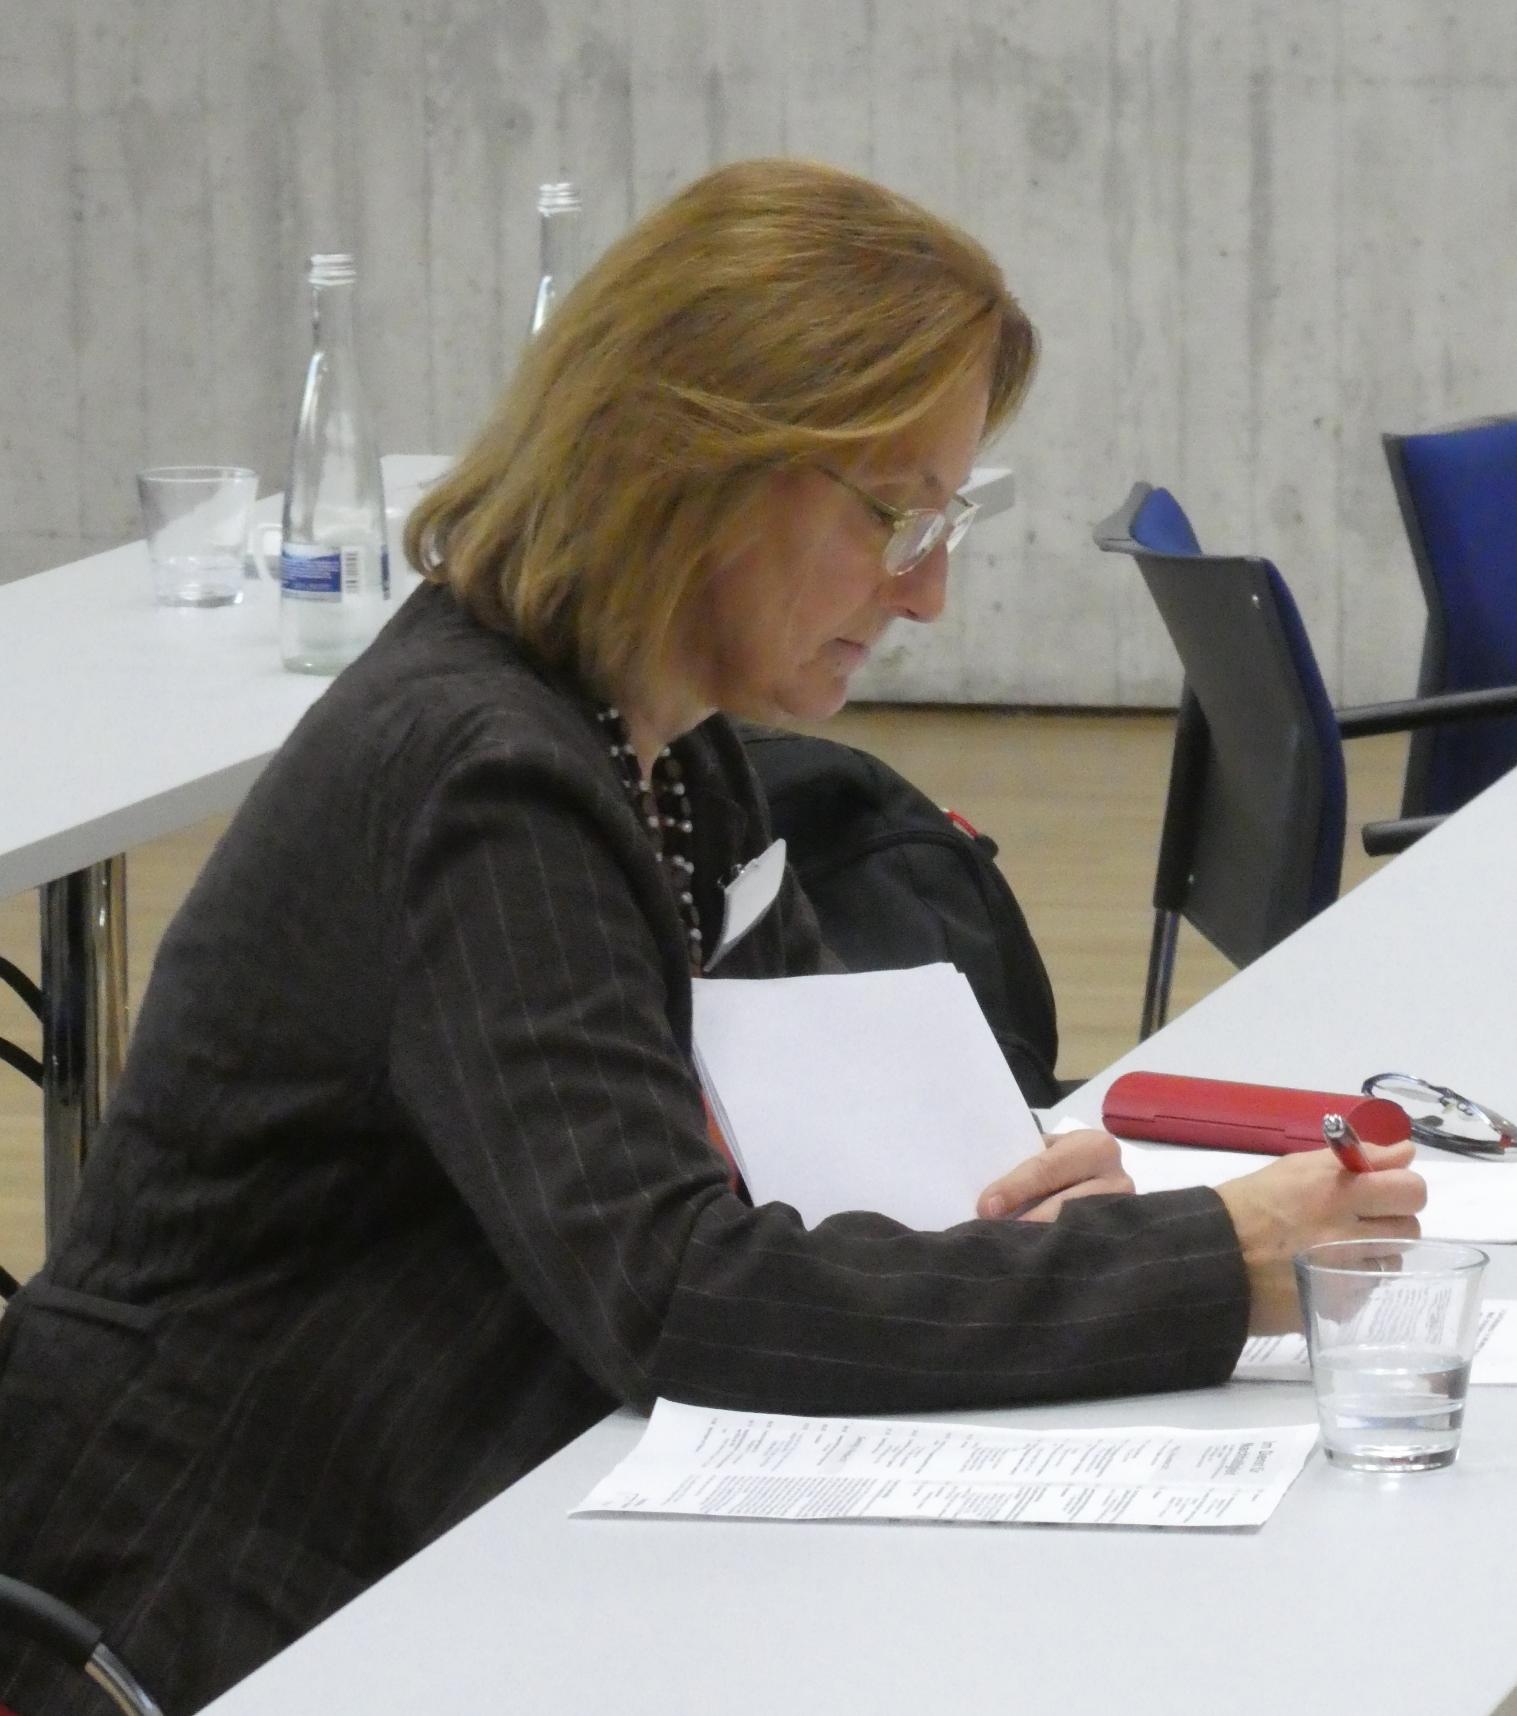 Susanne Bergius protokolliert - Foto © Gerhard Hofmann, Agentur Zukunft